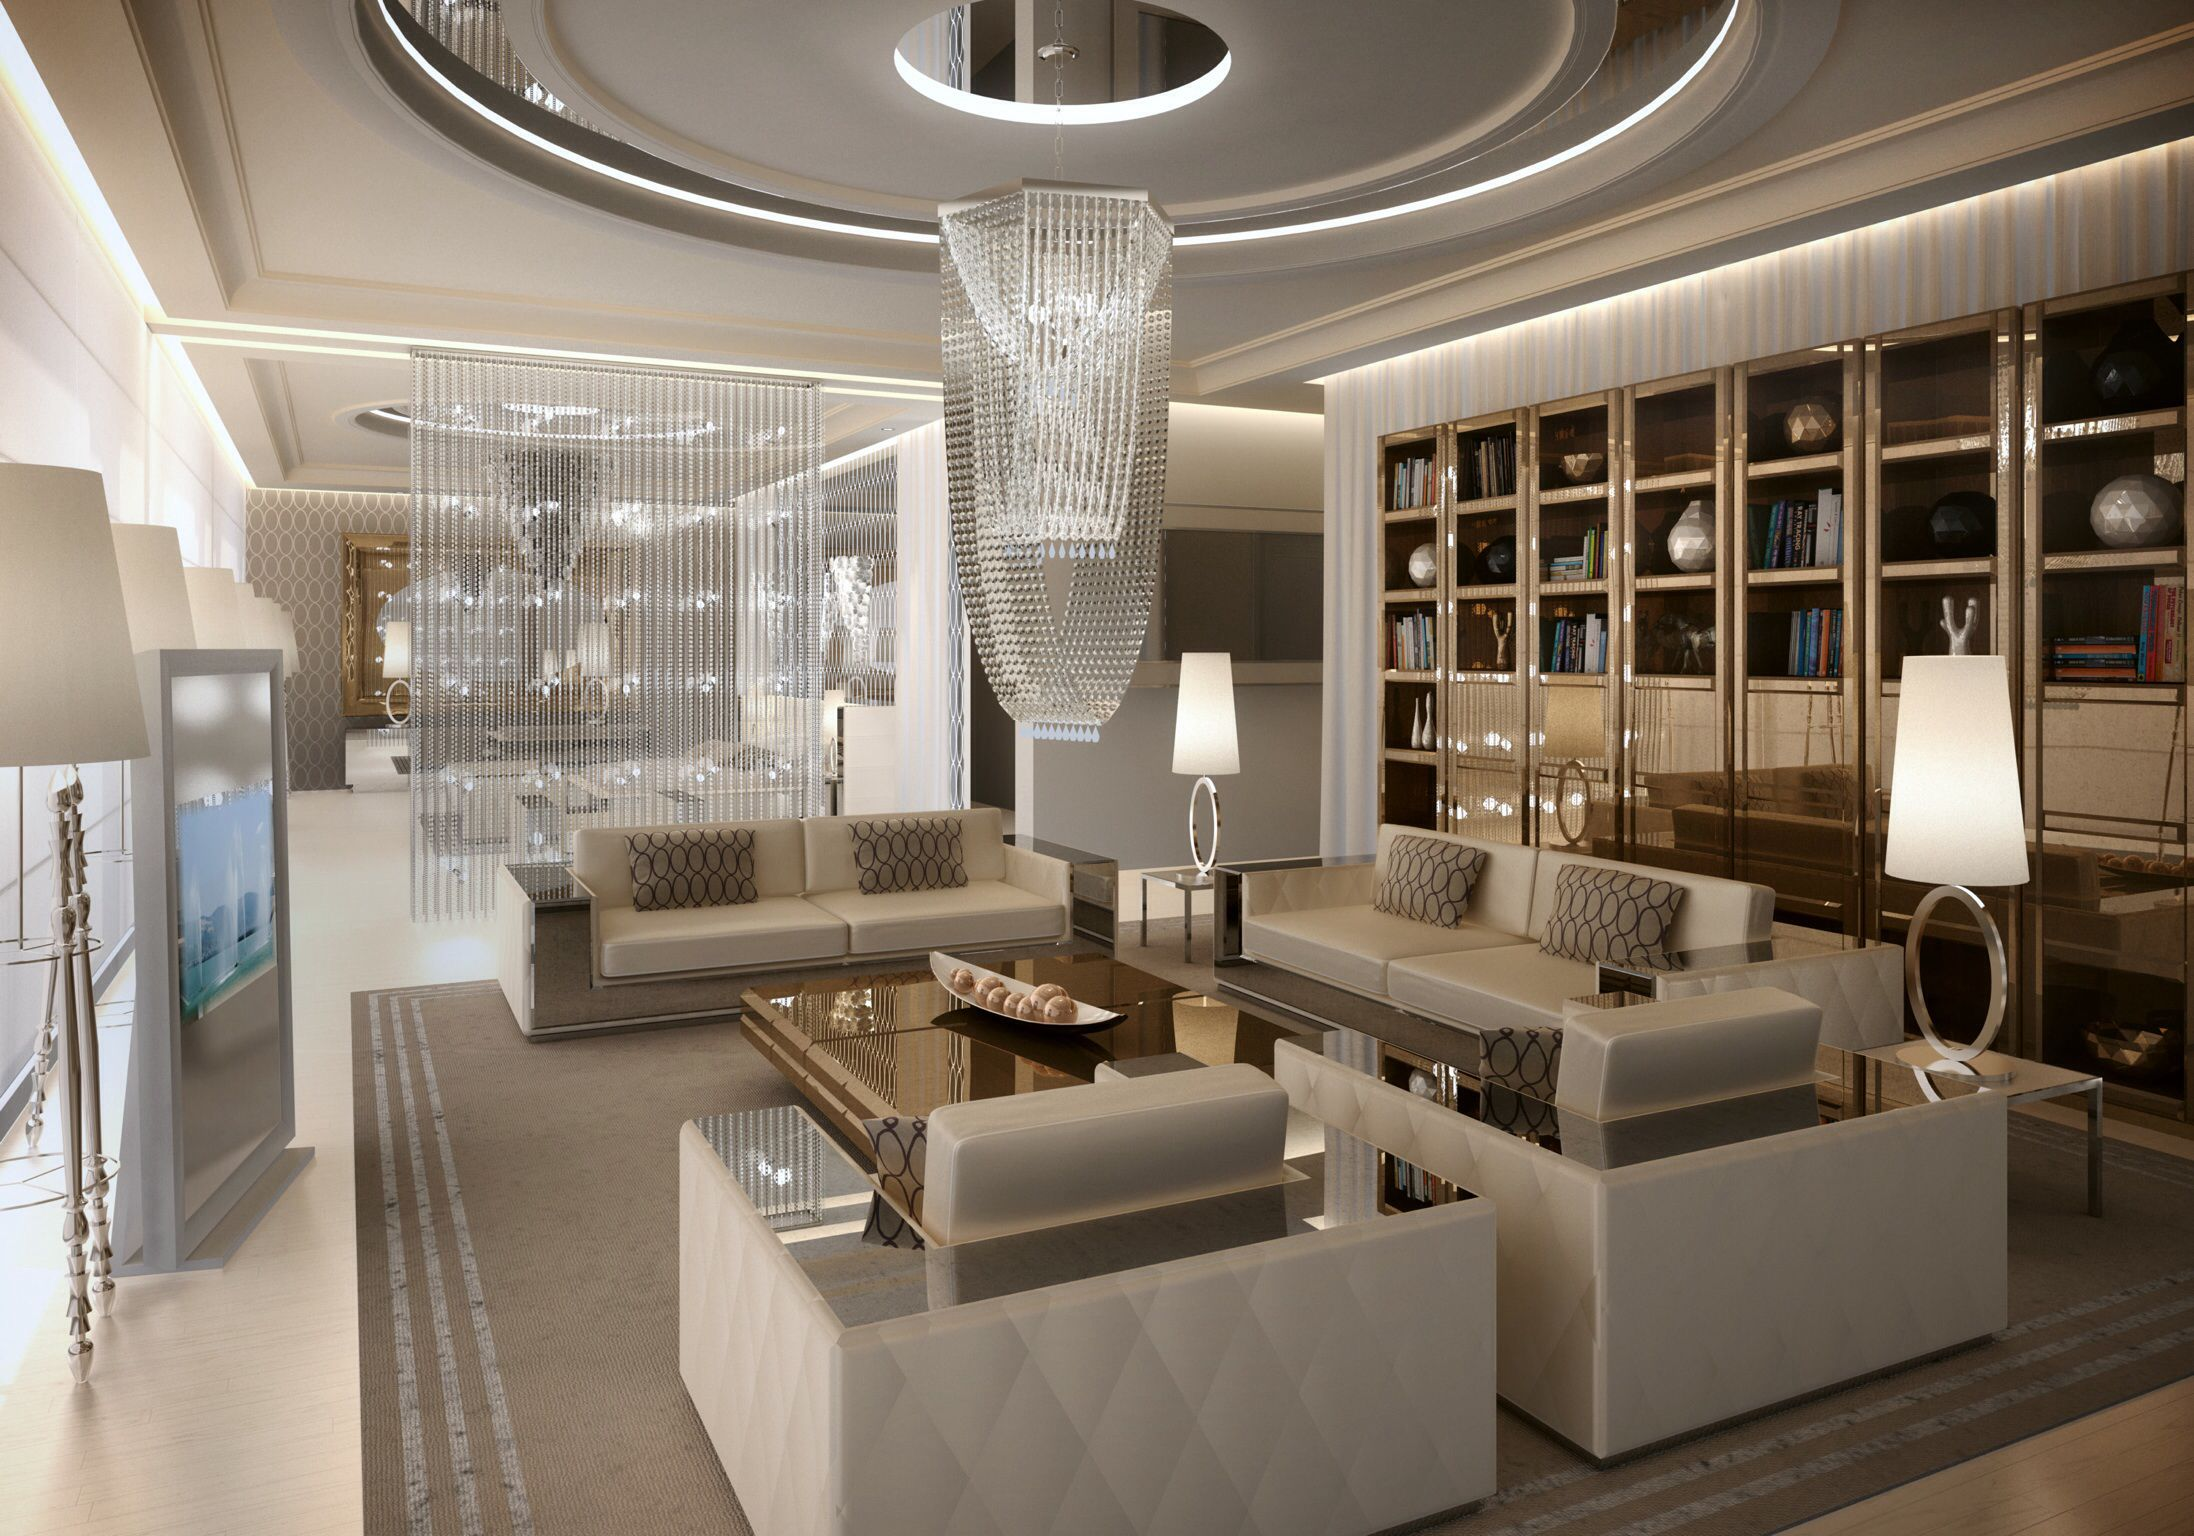 Ultra modern bedroom interior design living  客廳 living room  pinterest  interiors